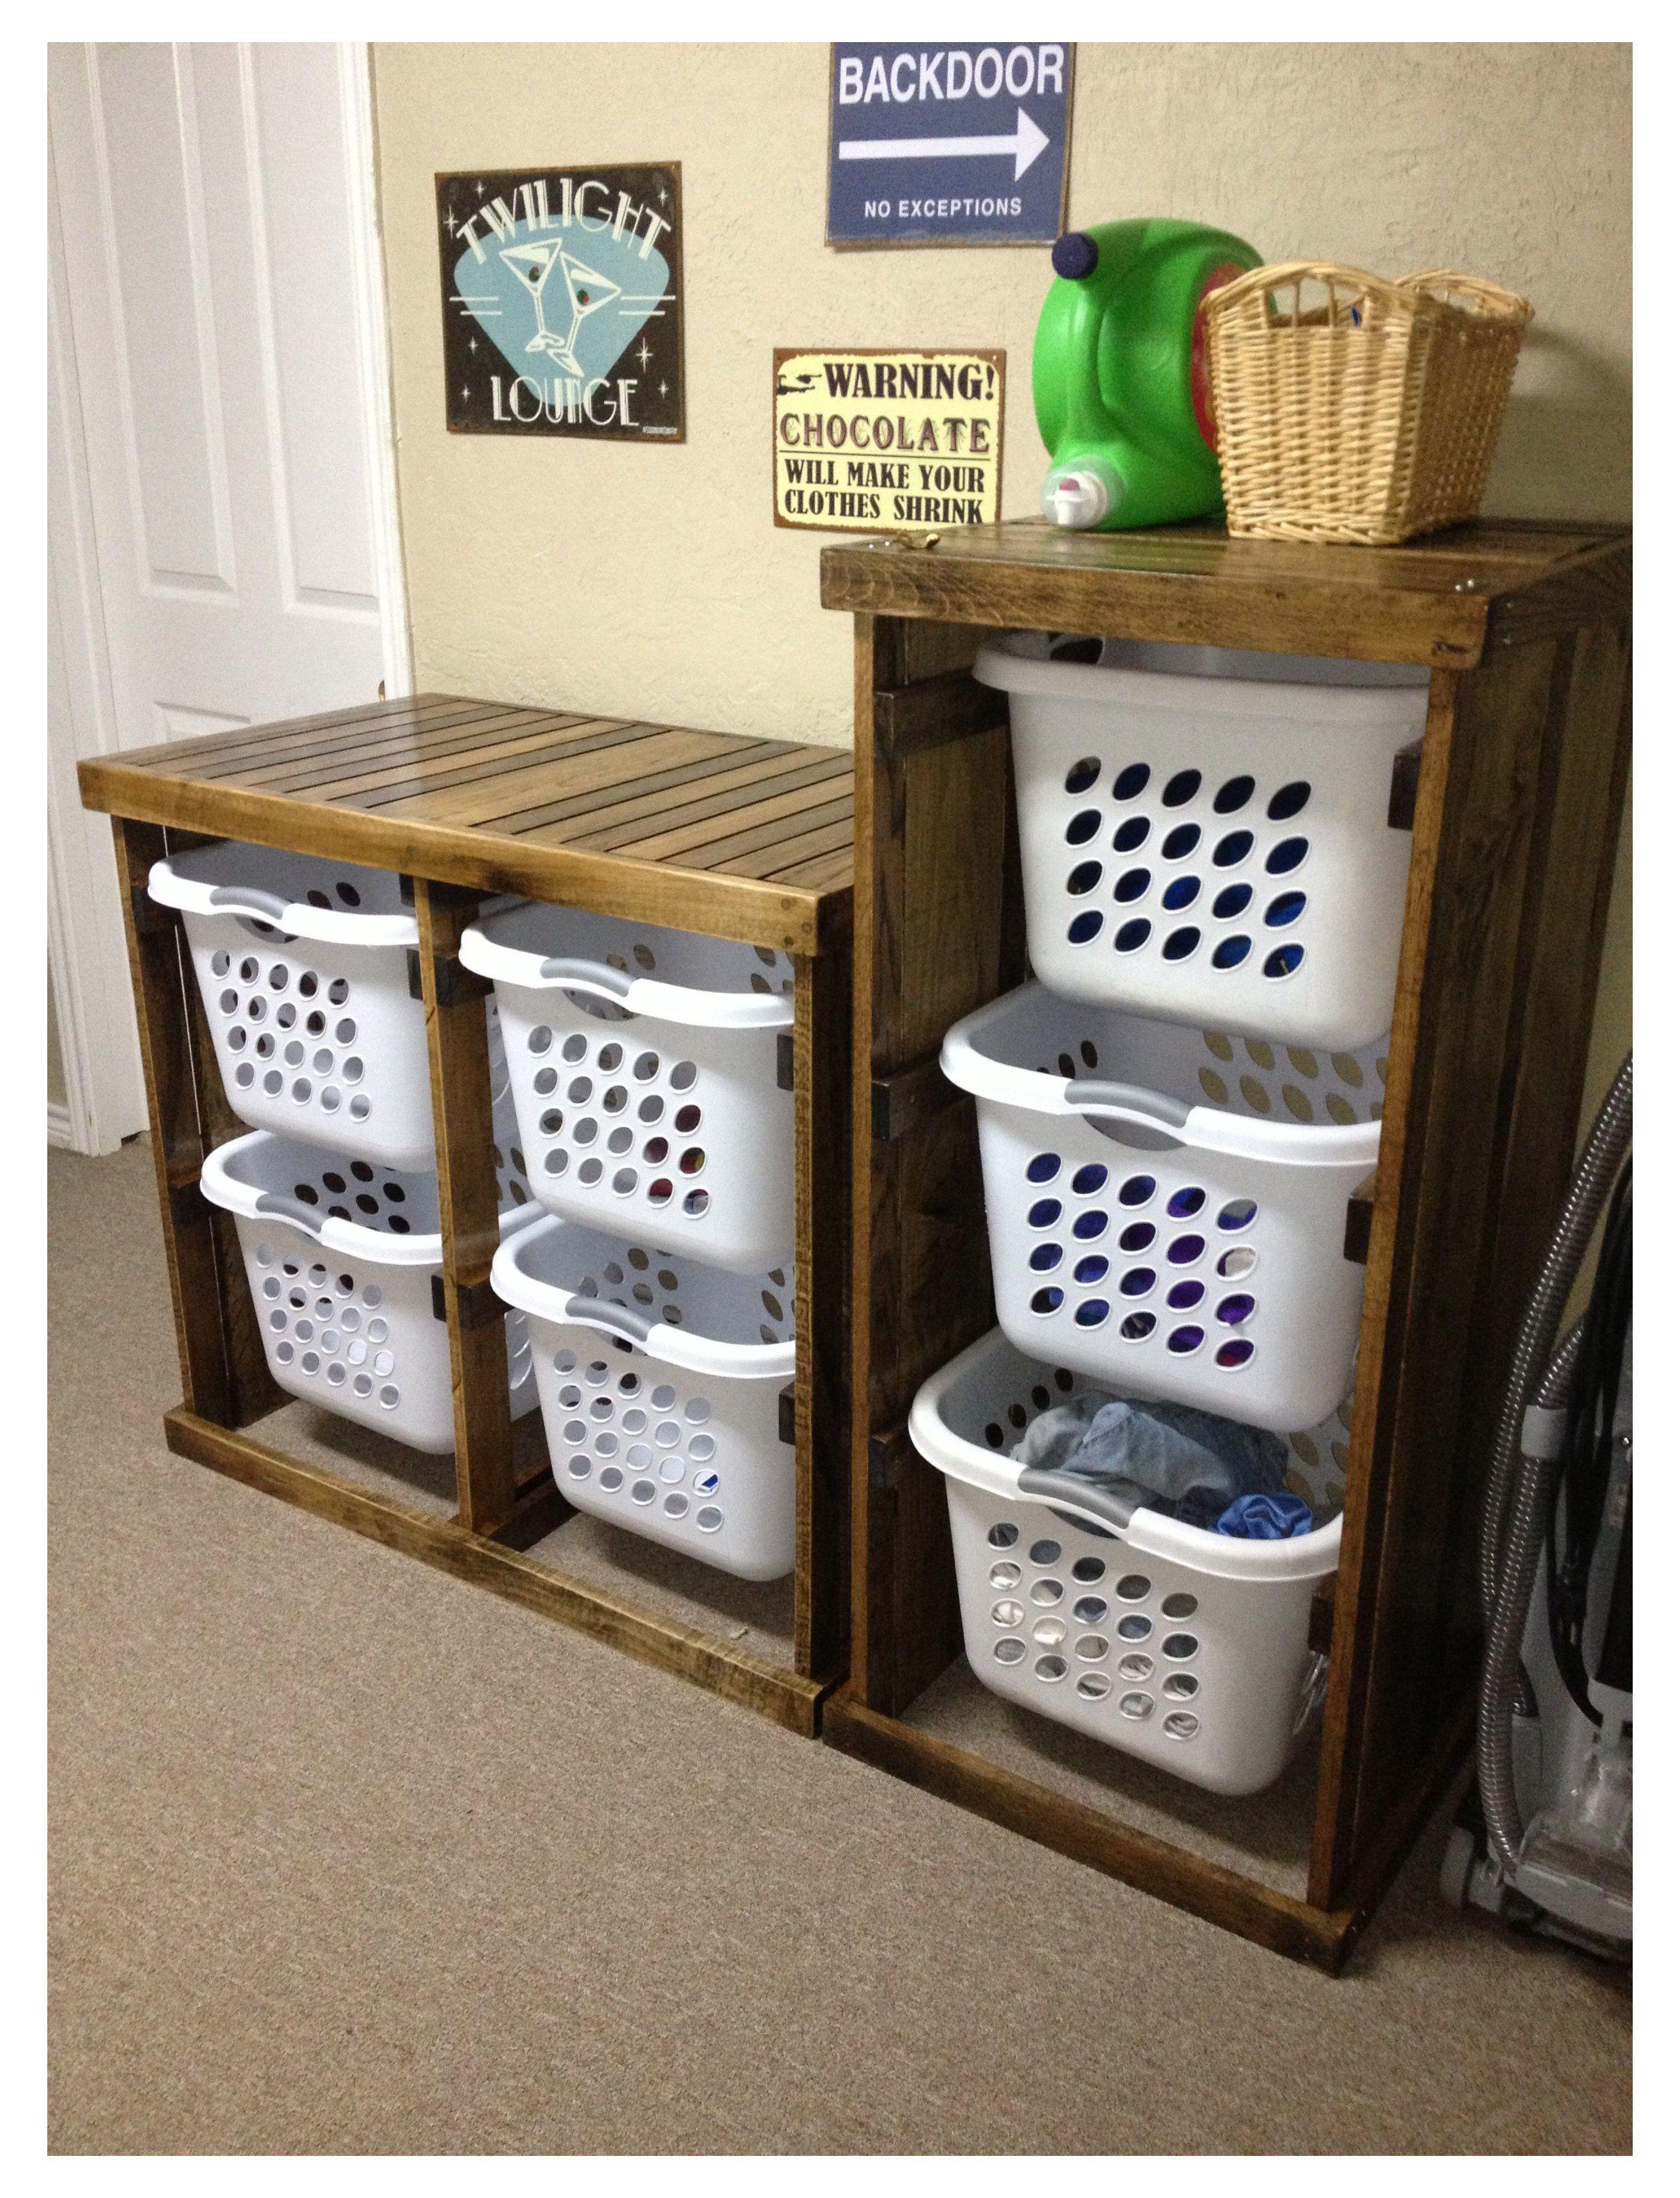 Laundry System Laundry System In 2020 Laundry Room Diy Laundry Room Decor Diy Laundry